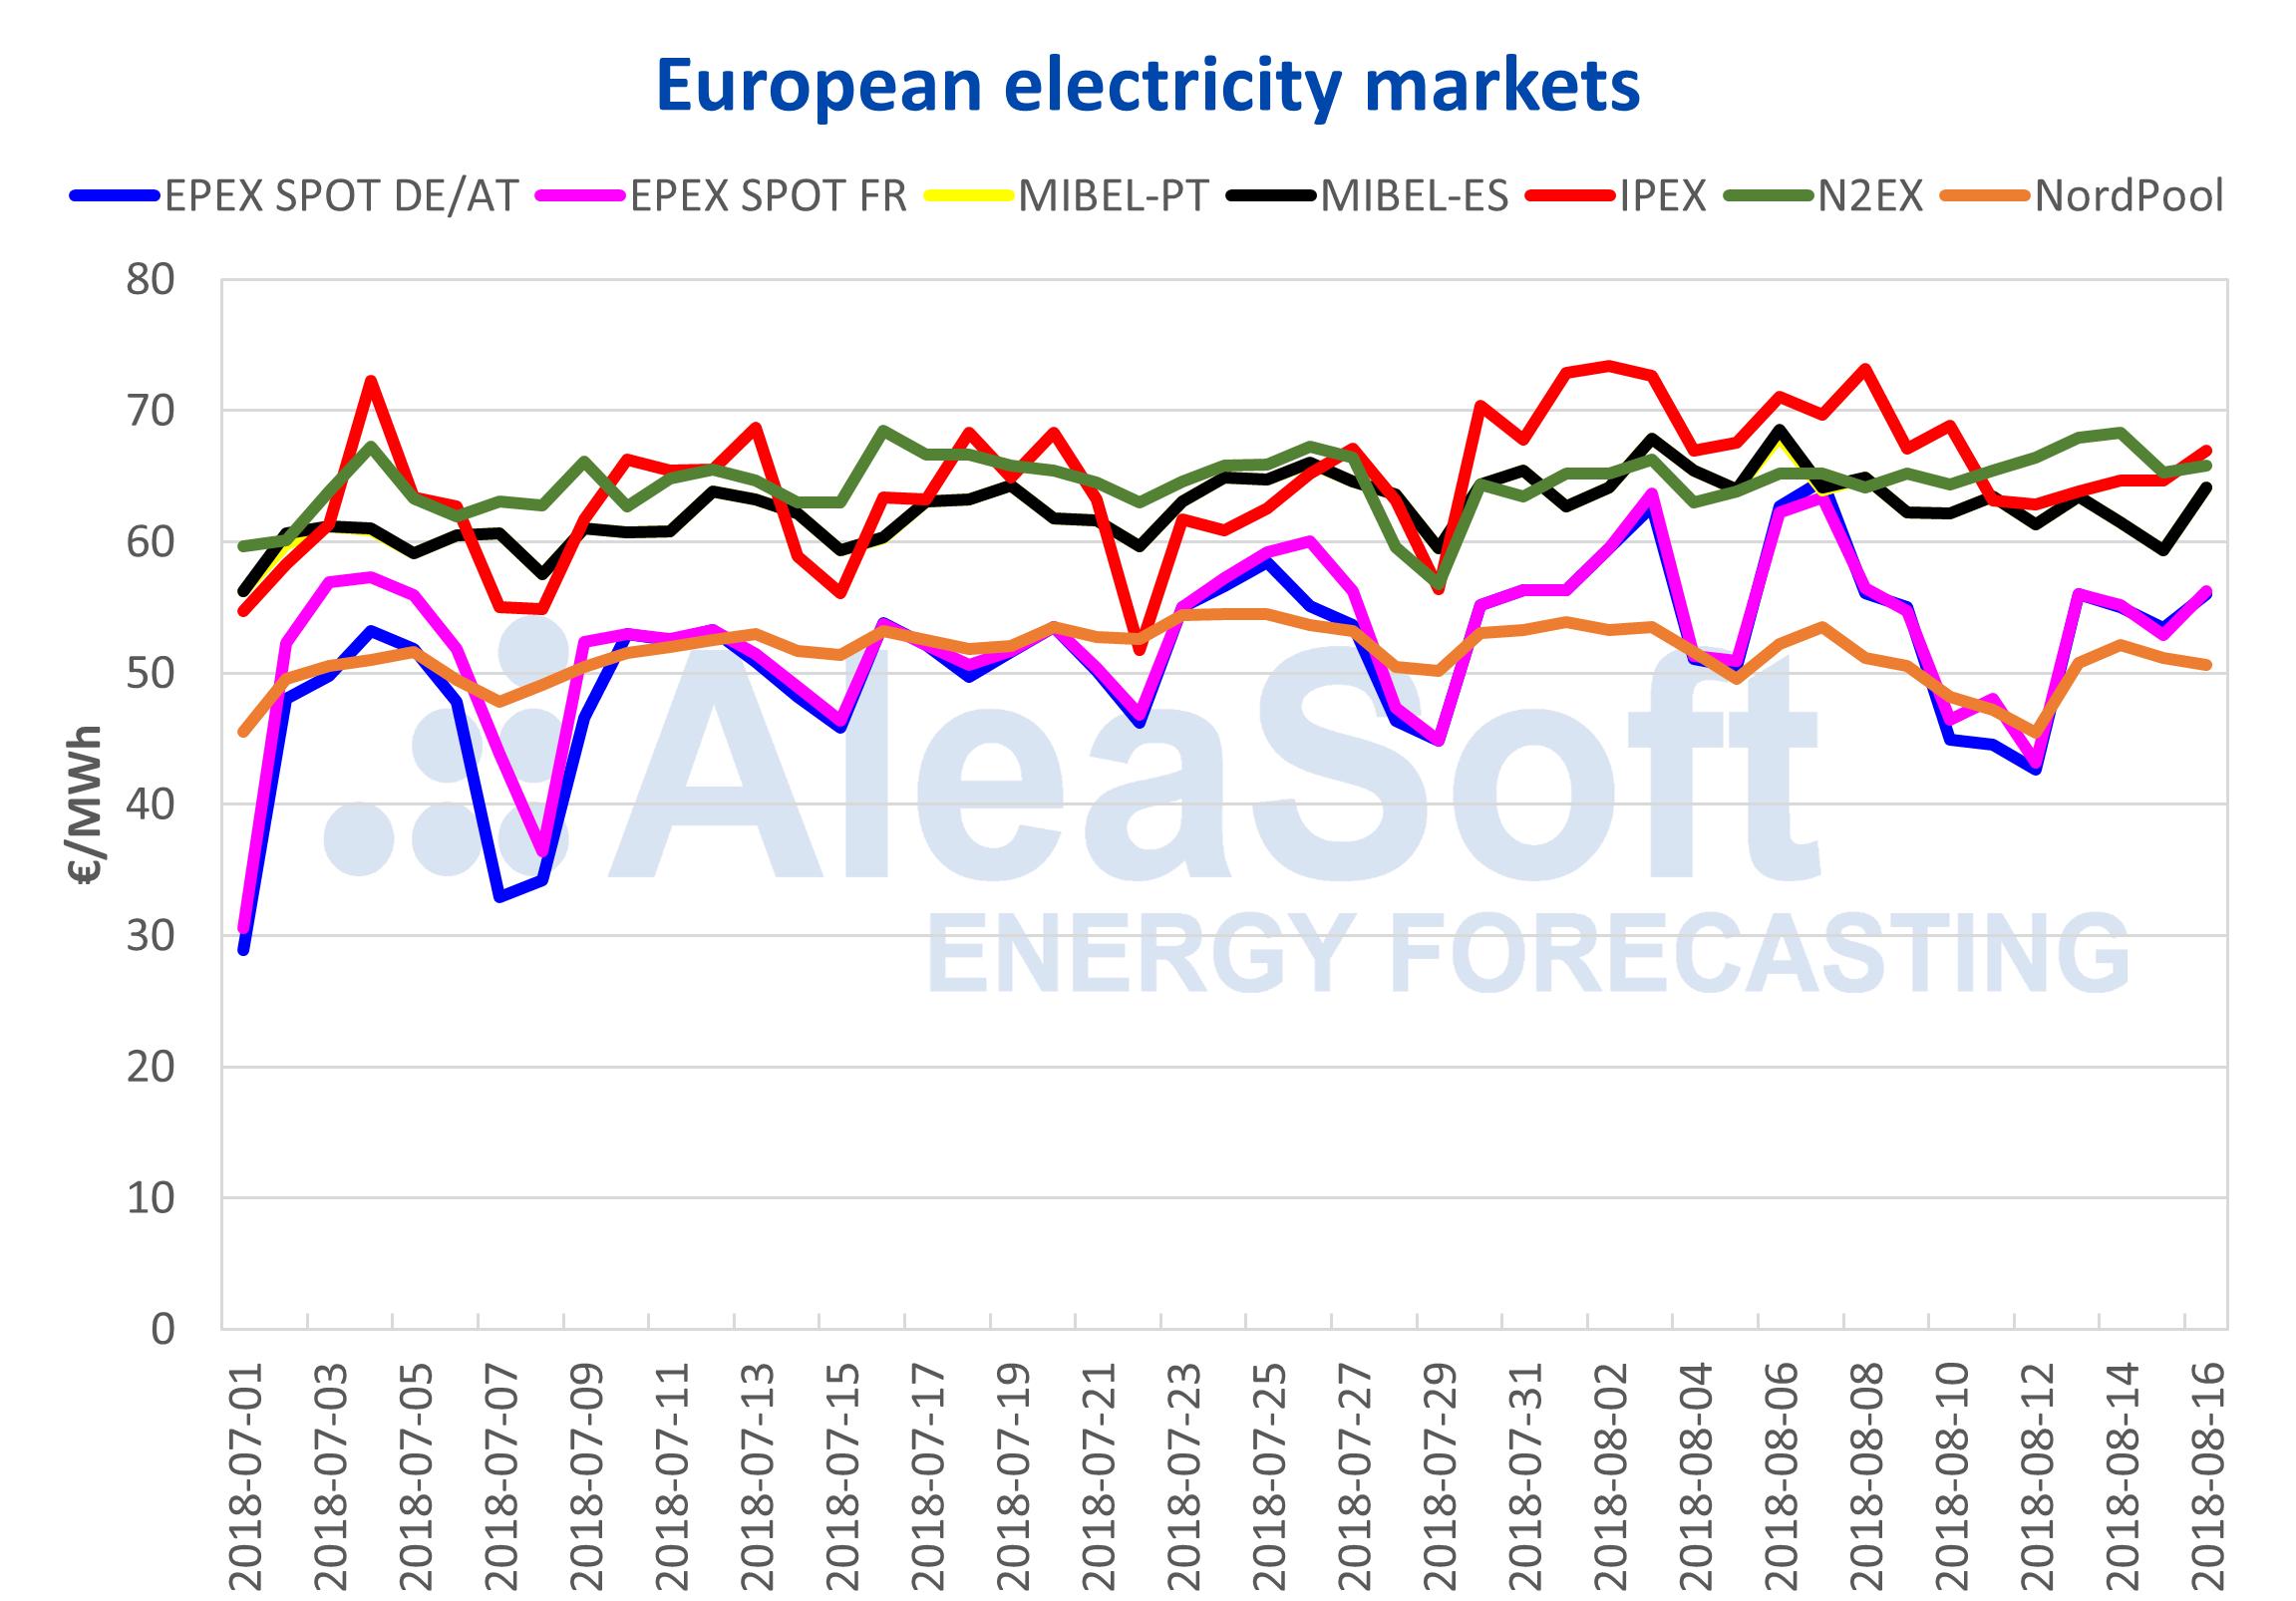 AleaSoft – European electricity markets